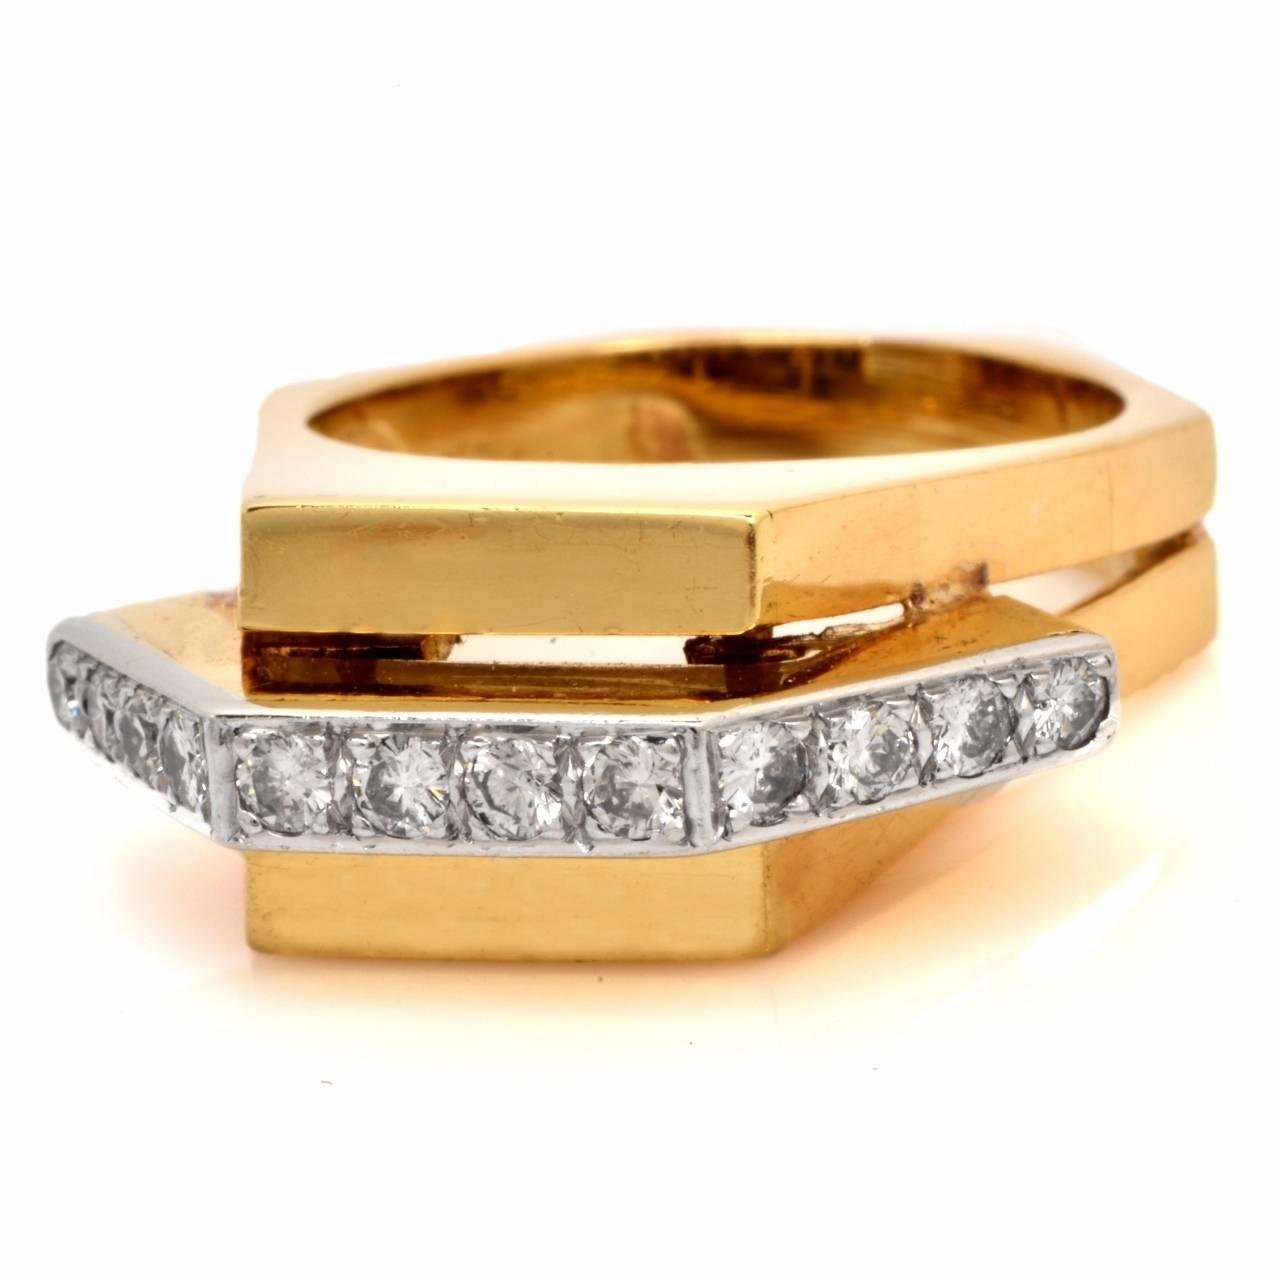 Retro Diamond Gold Geometric Pyramidal Design Ring 8